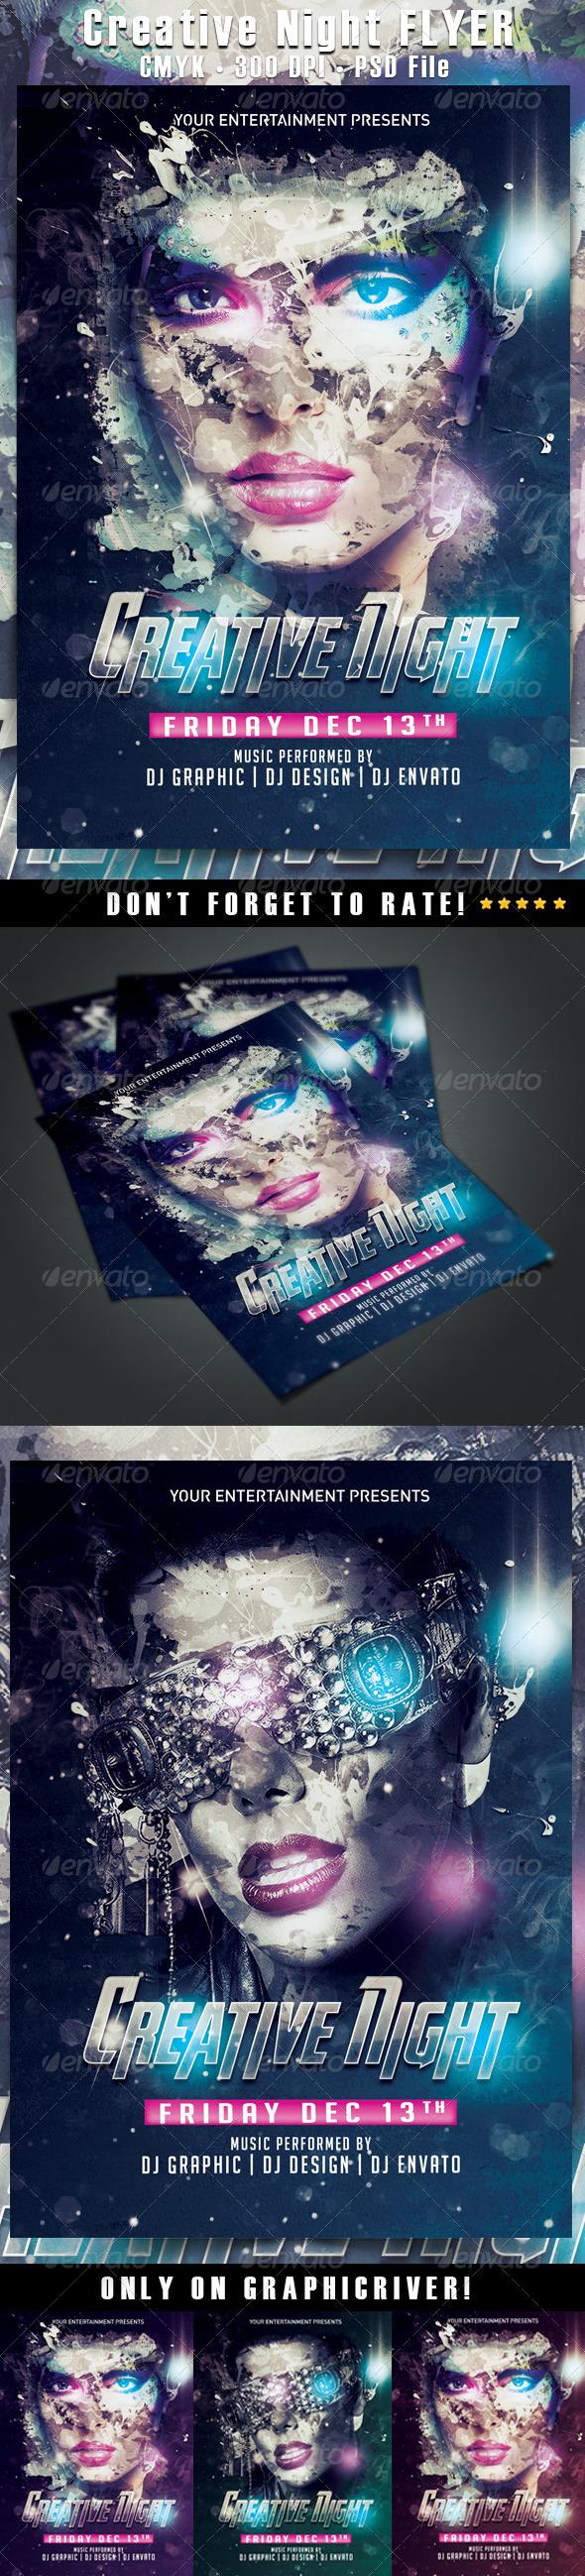 GraphicRiver Creative Night Flyer 6473904